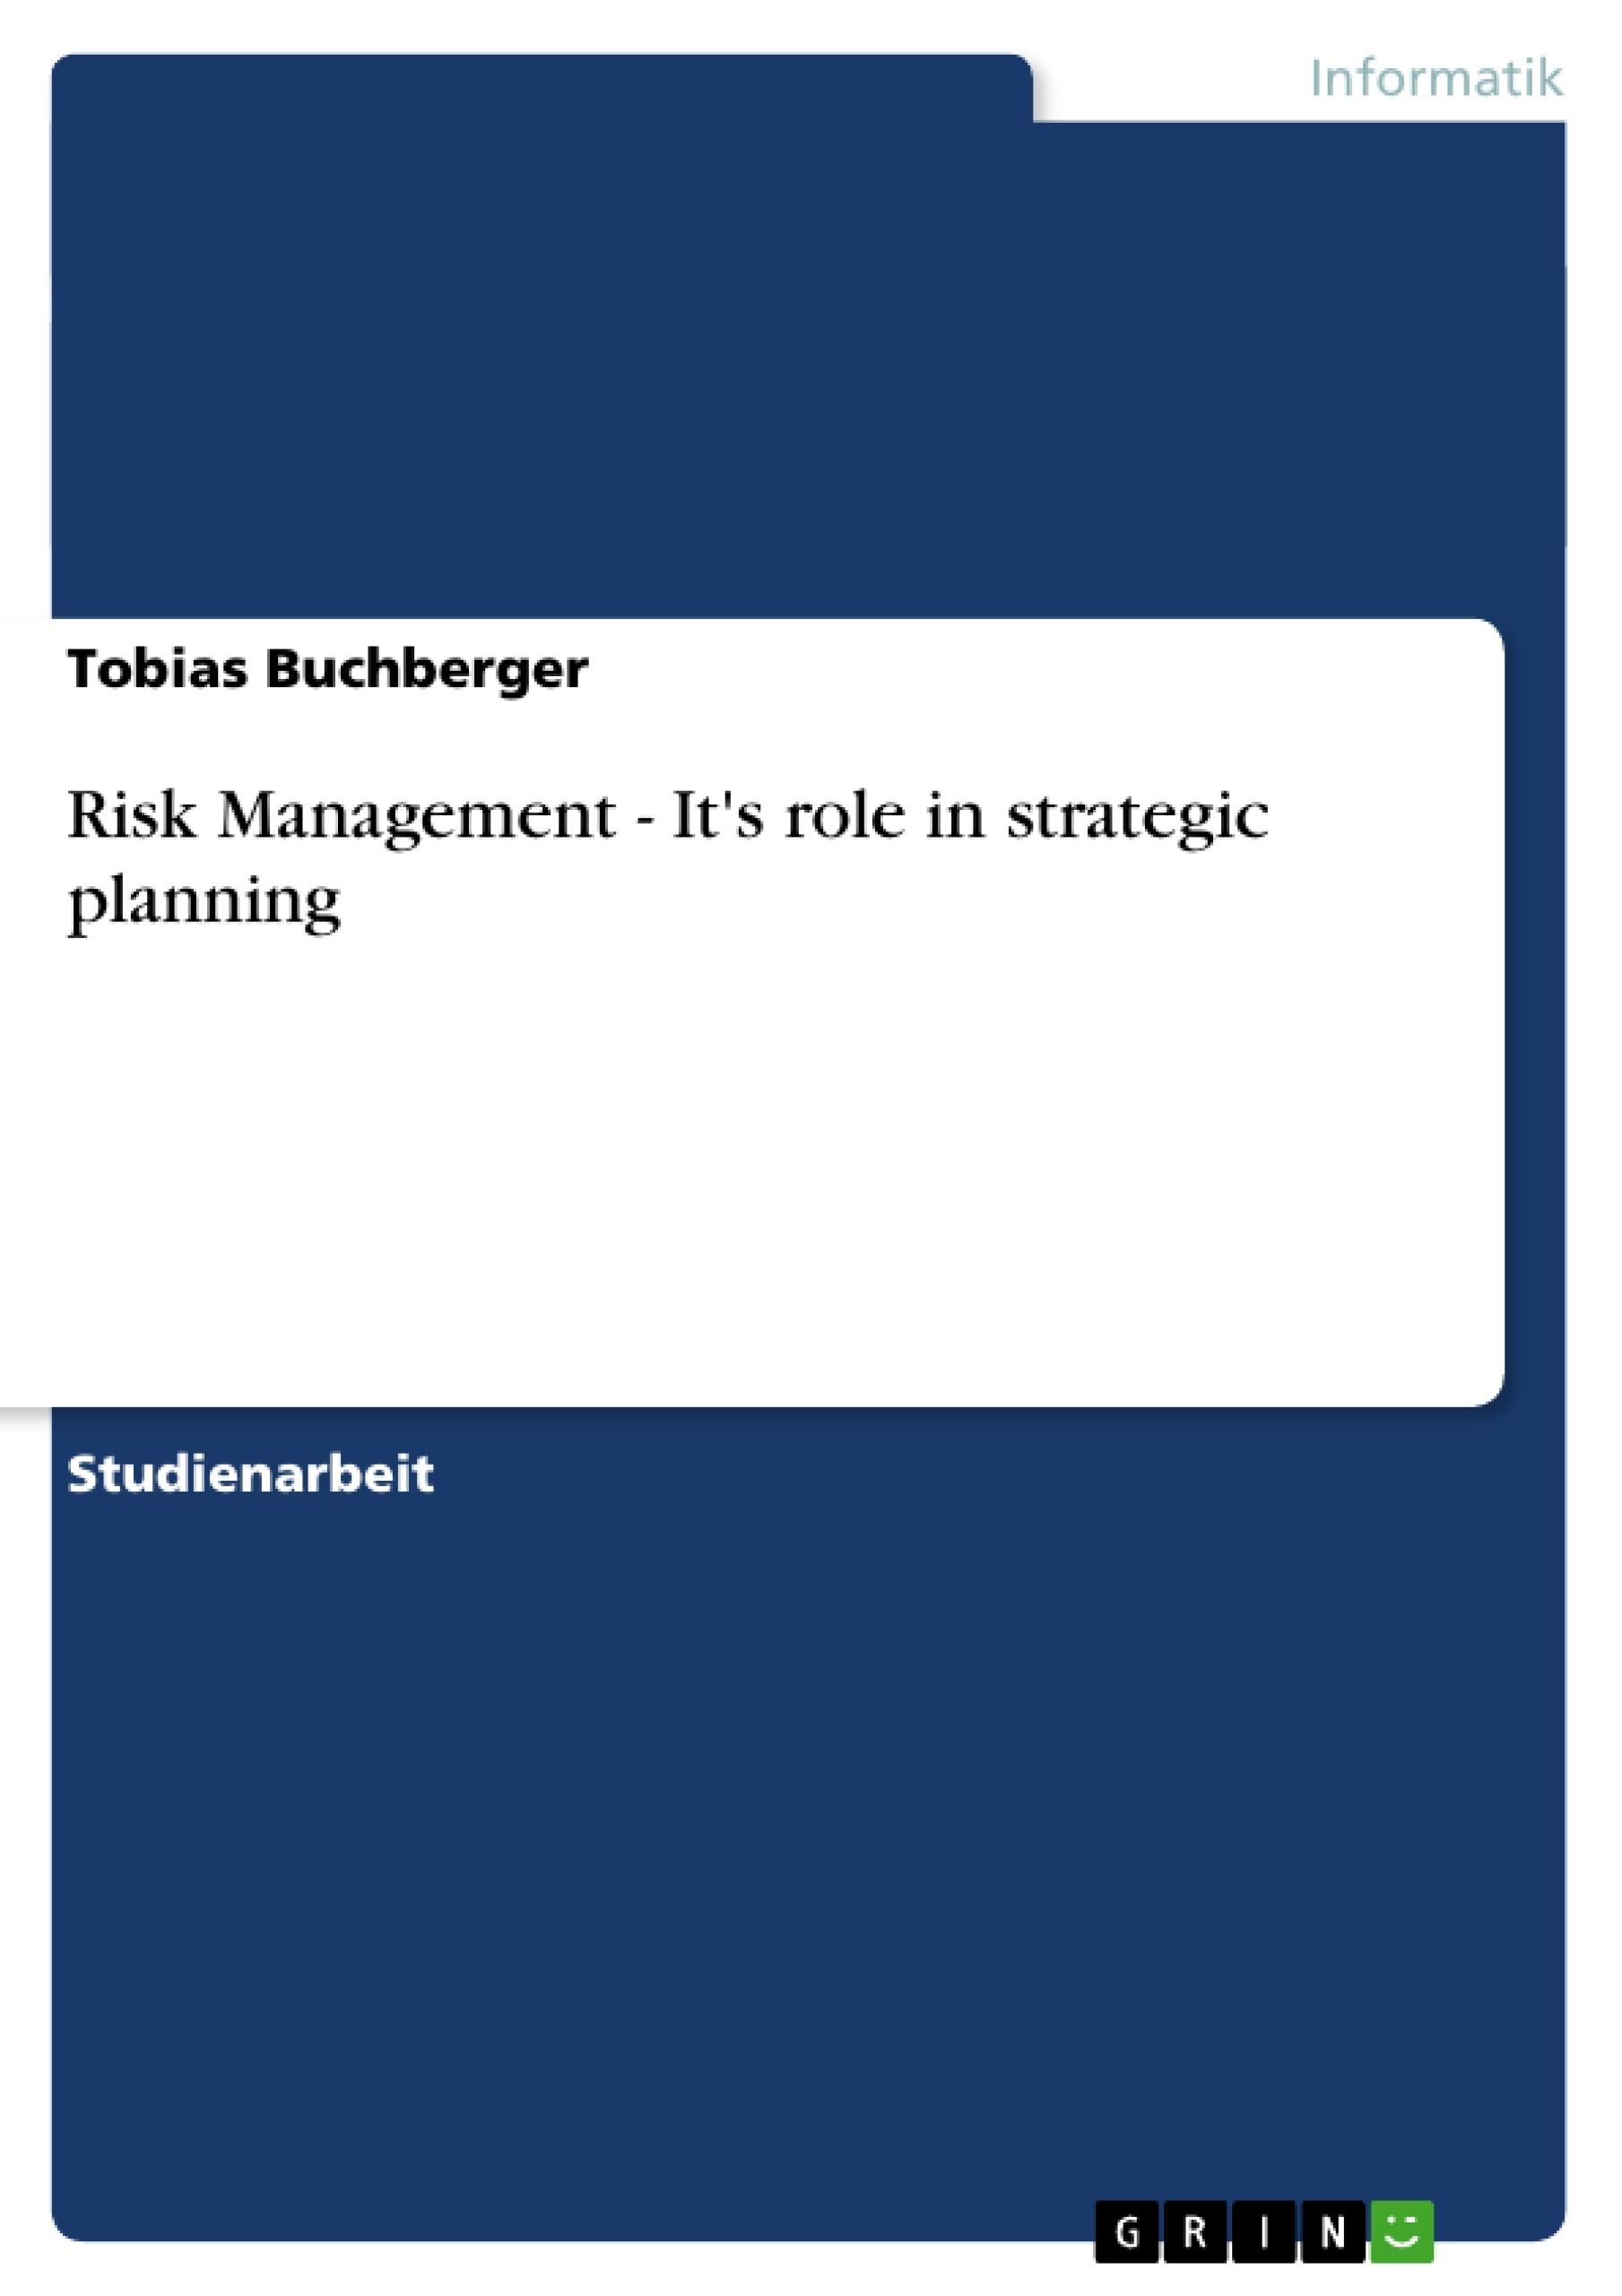 Titel: Risk Management - It's role in strategic planning